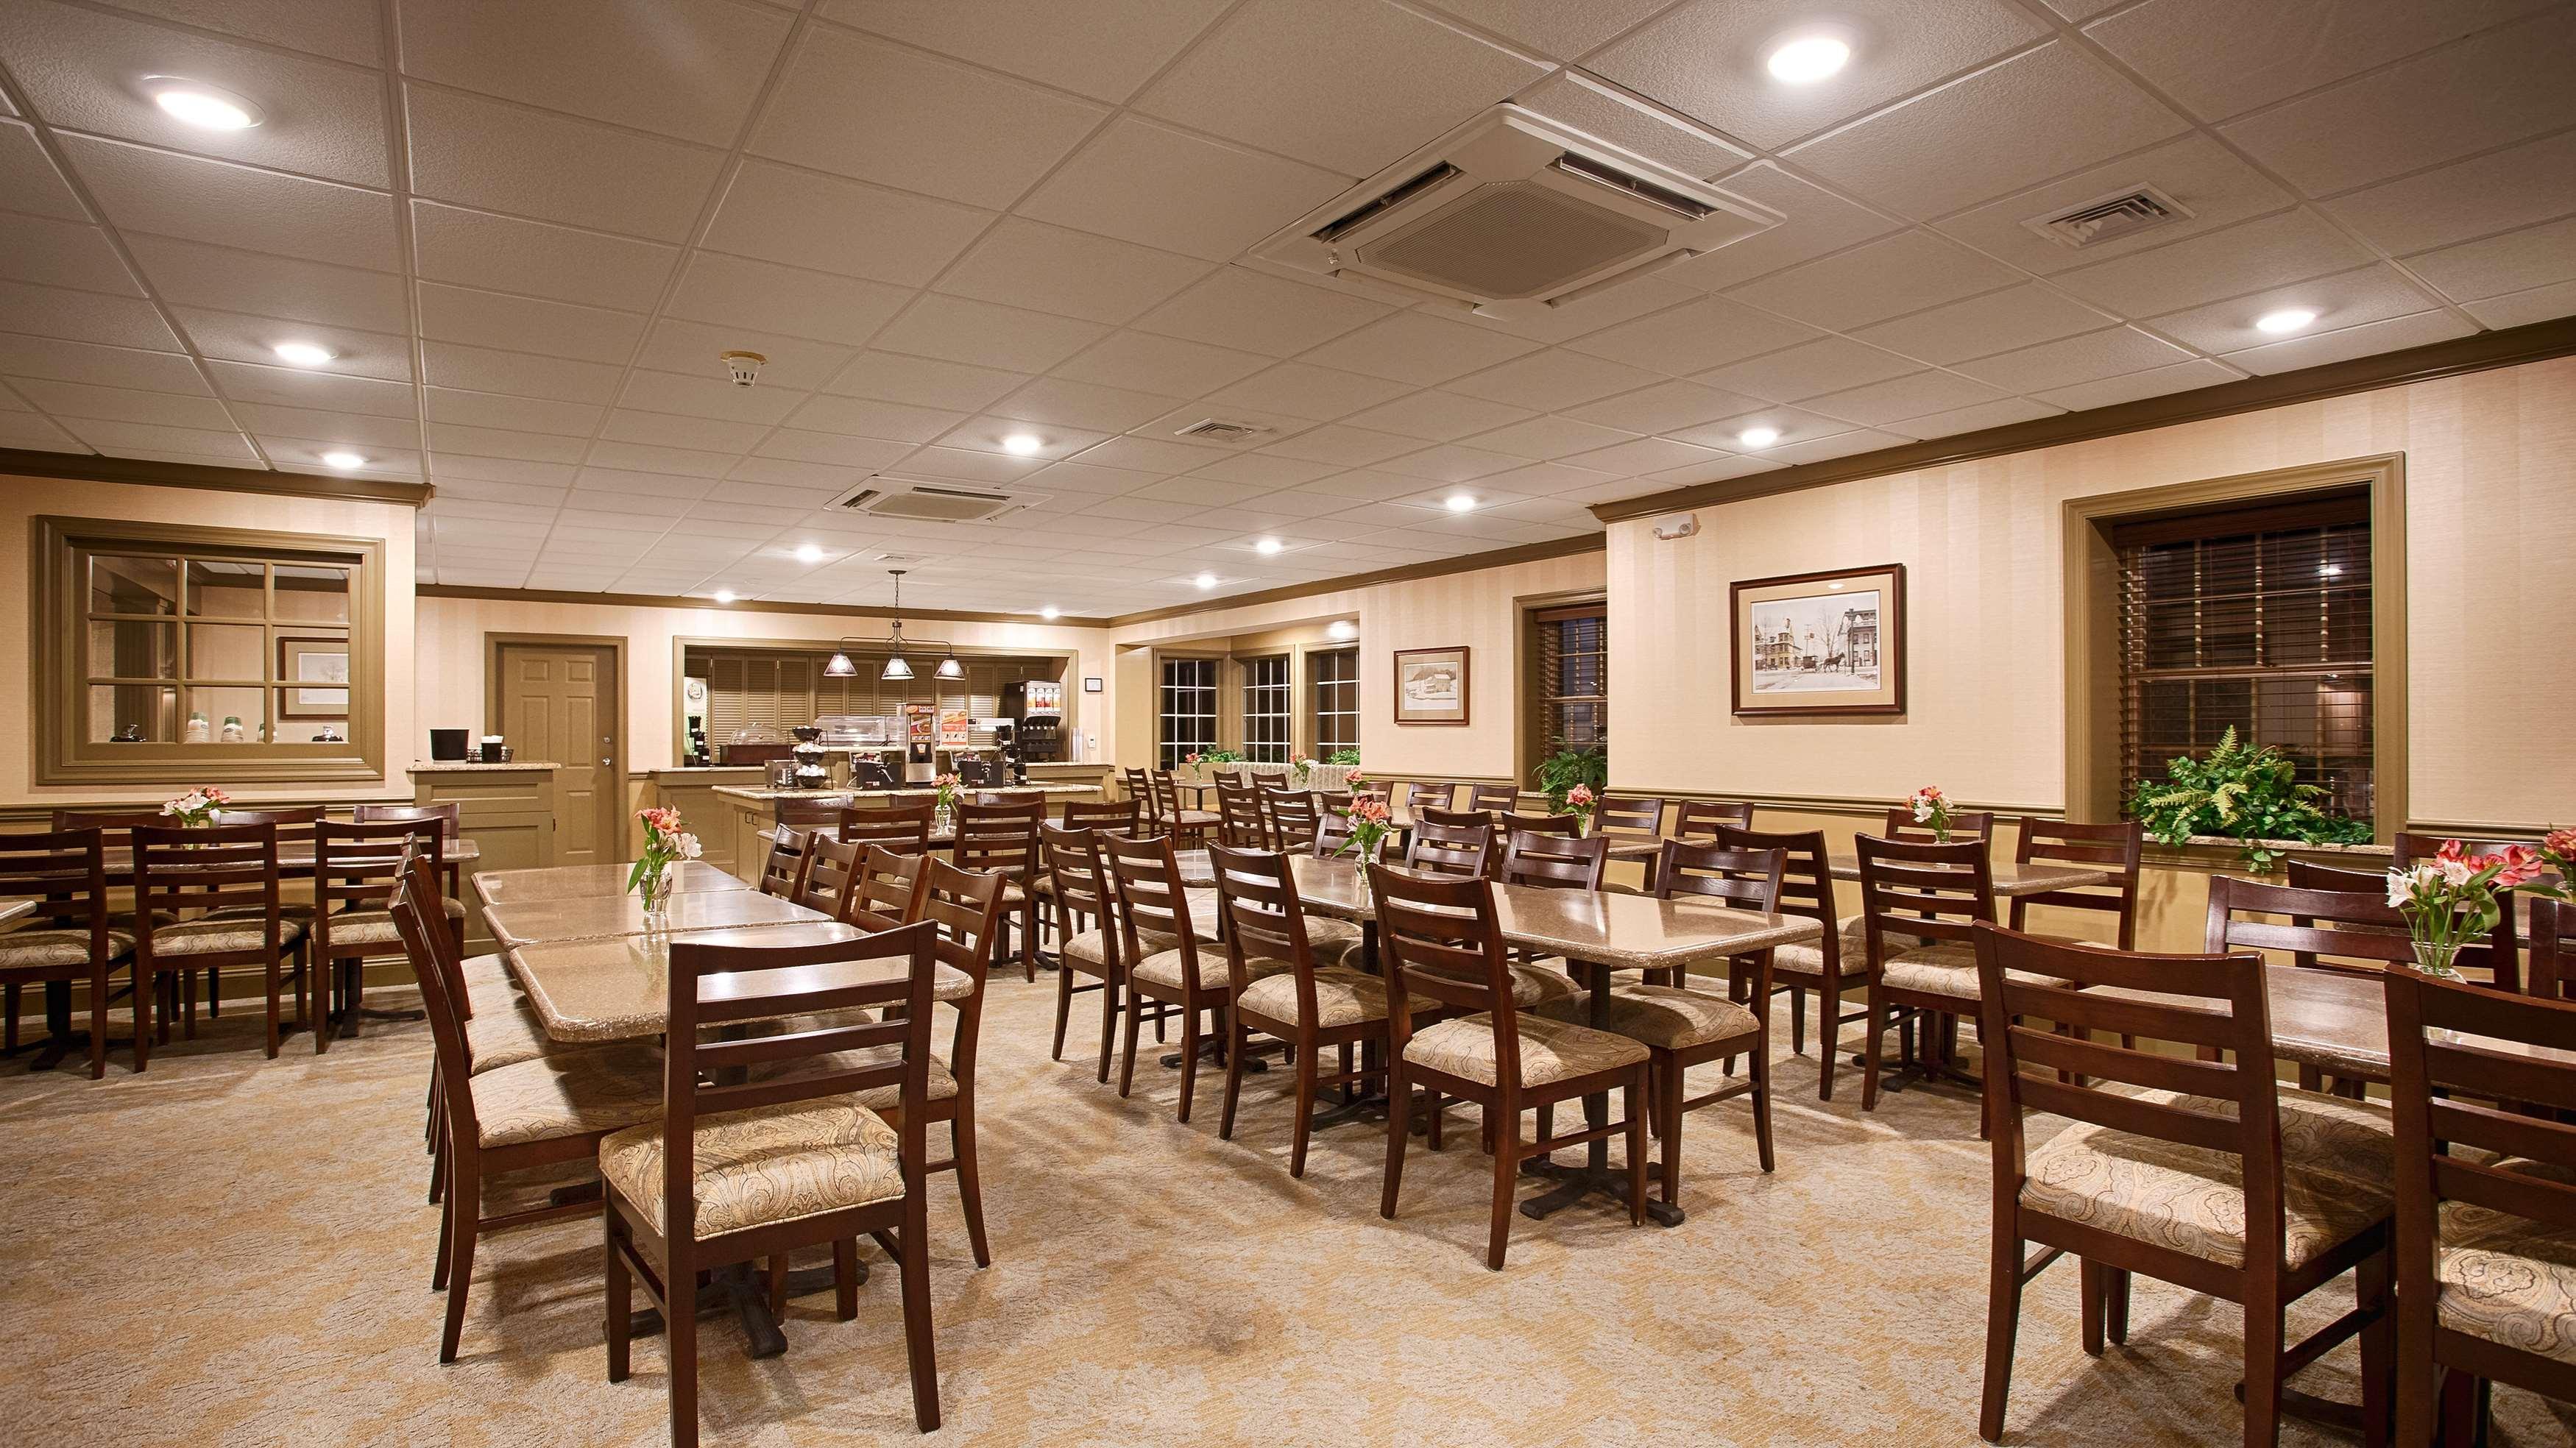 Best Western Country Cupboard Inn Fridge All Rooms